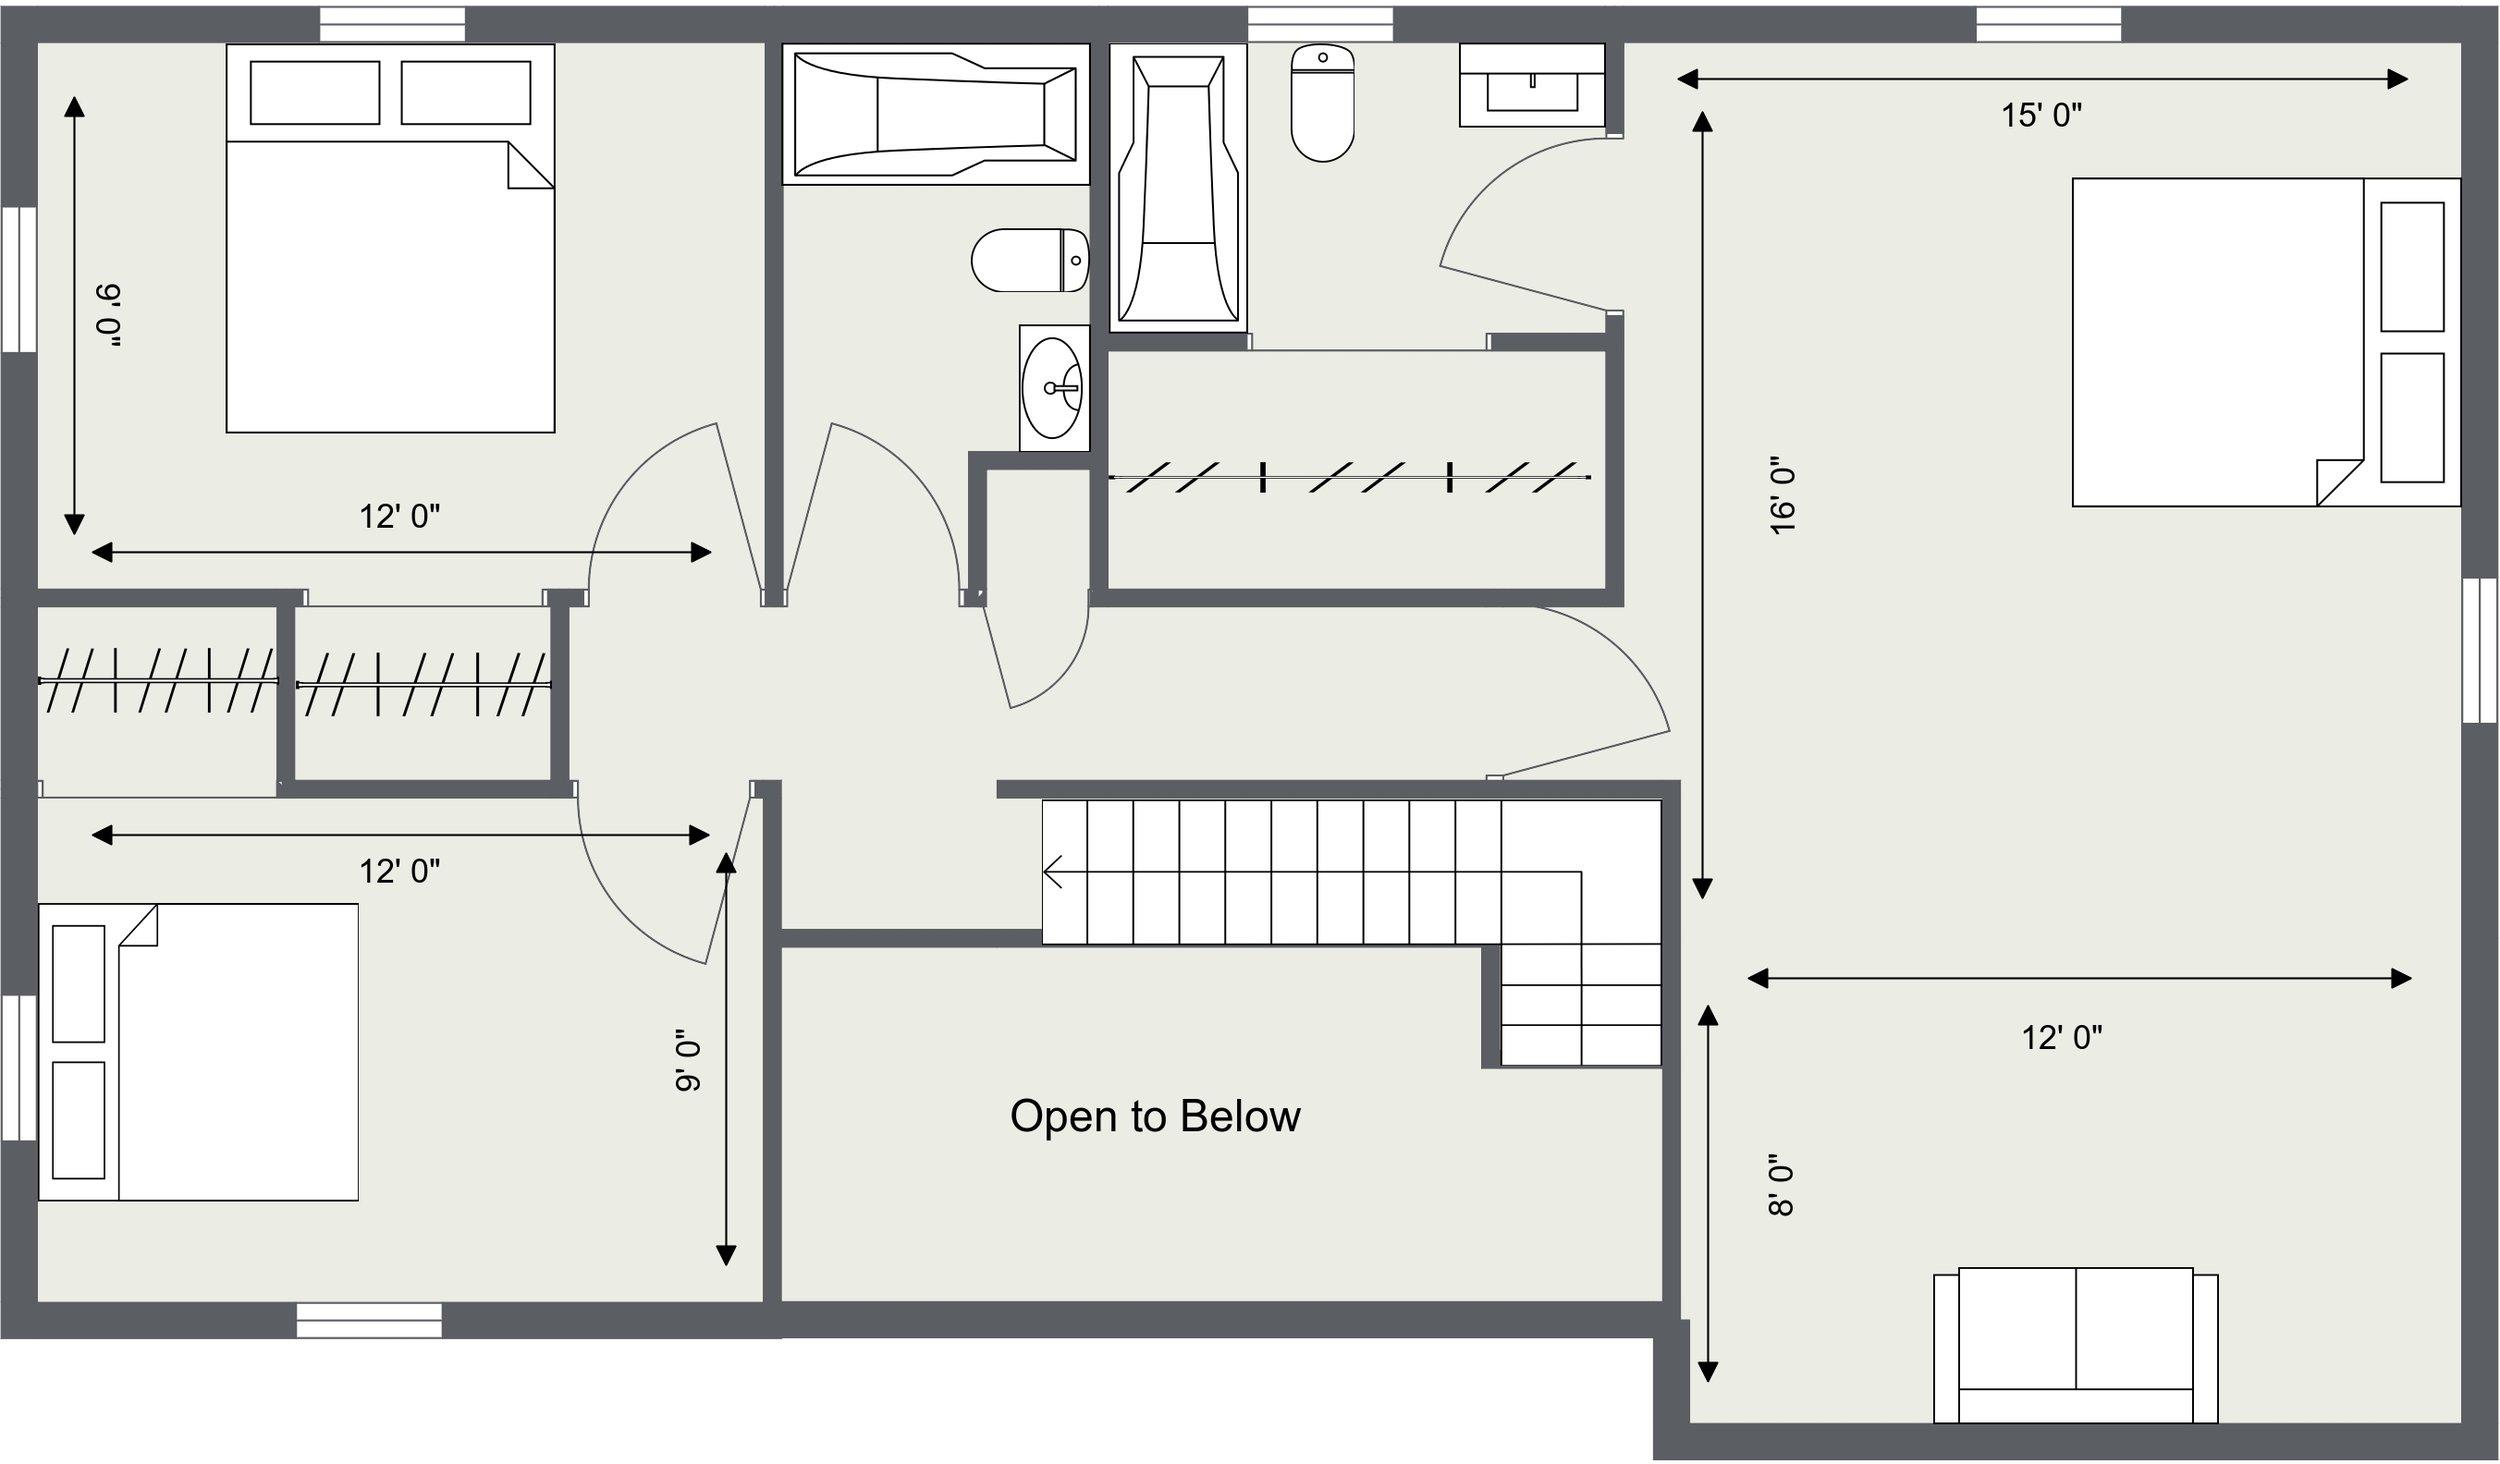 3080 South Street - 2. Floor - 2D Floor Plan.jpg